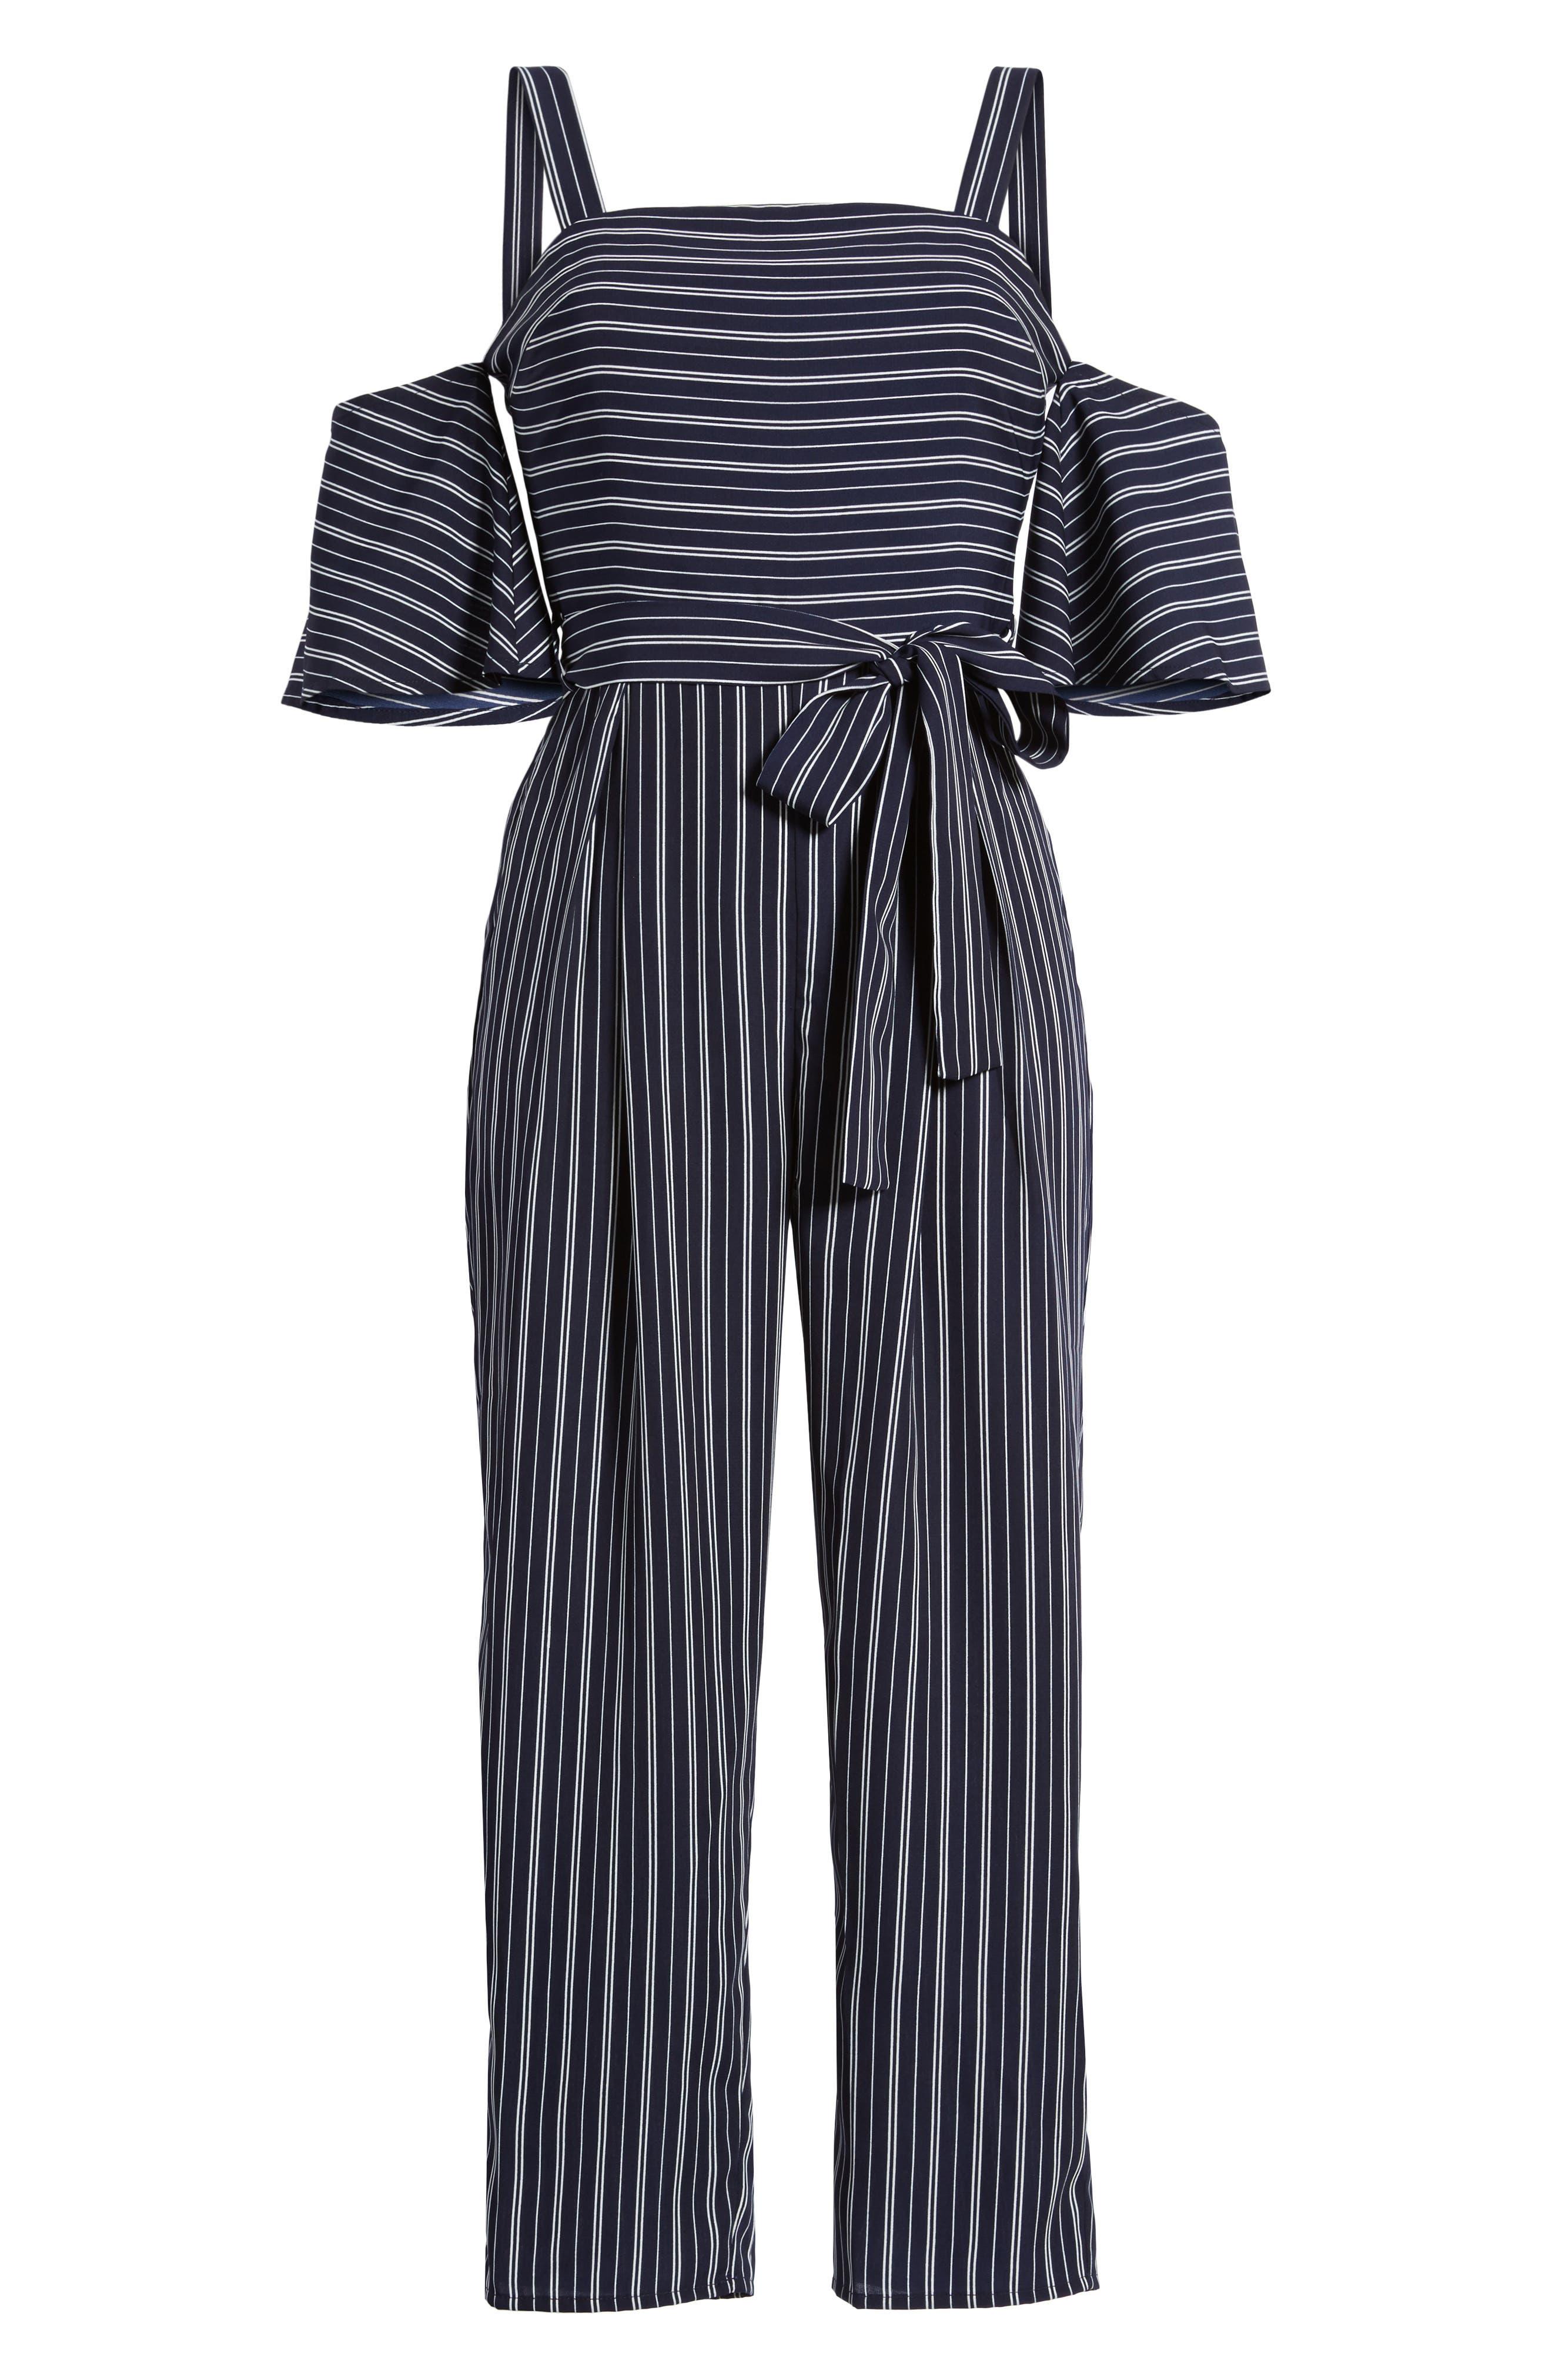 Stripe Off the Shoulder Crop Jumpsuit,                             Alternate thumbnail 6, color,                             Navy Ivory Stripe